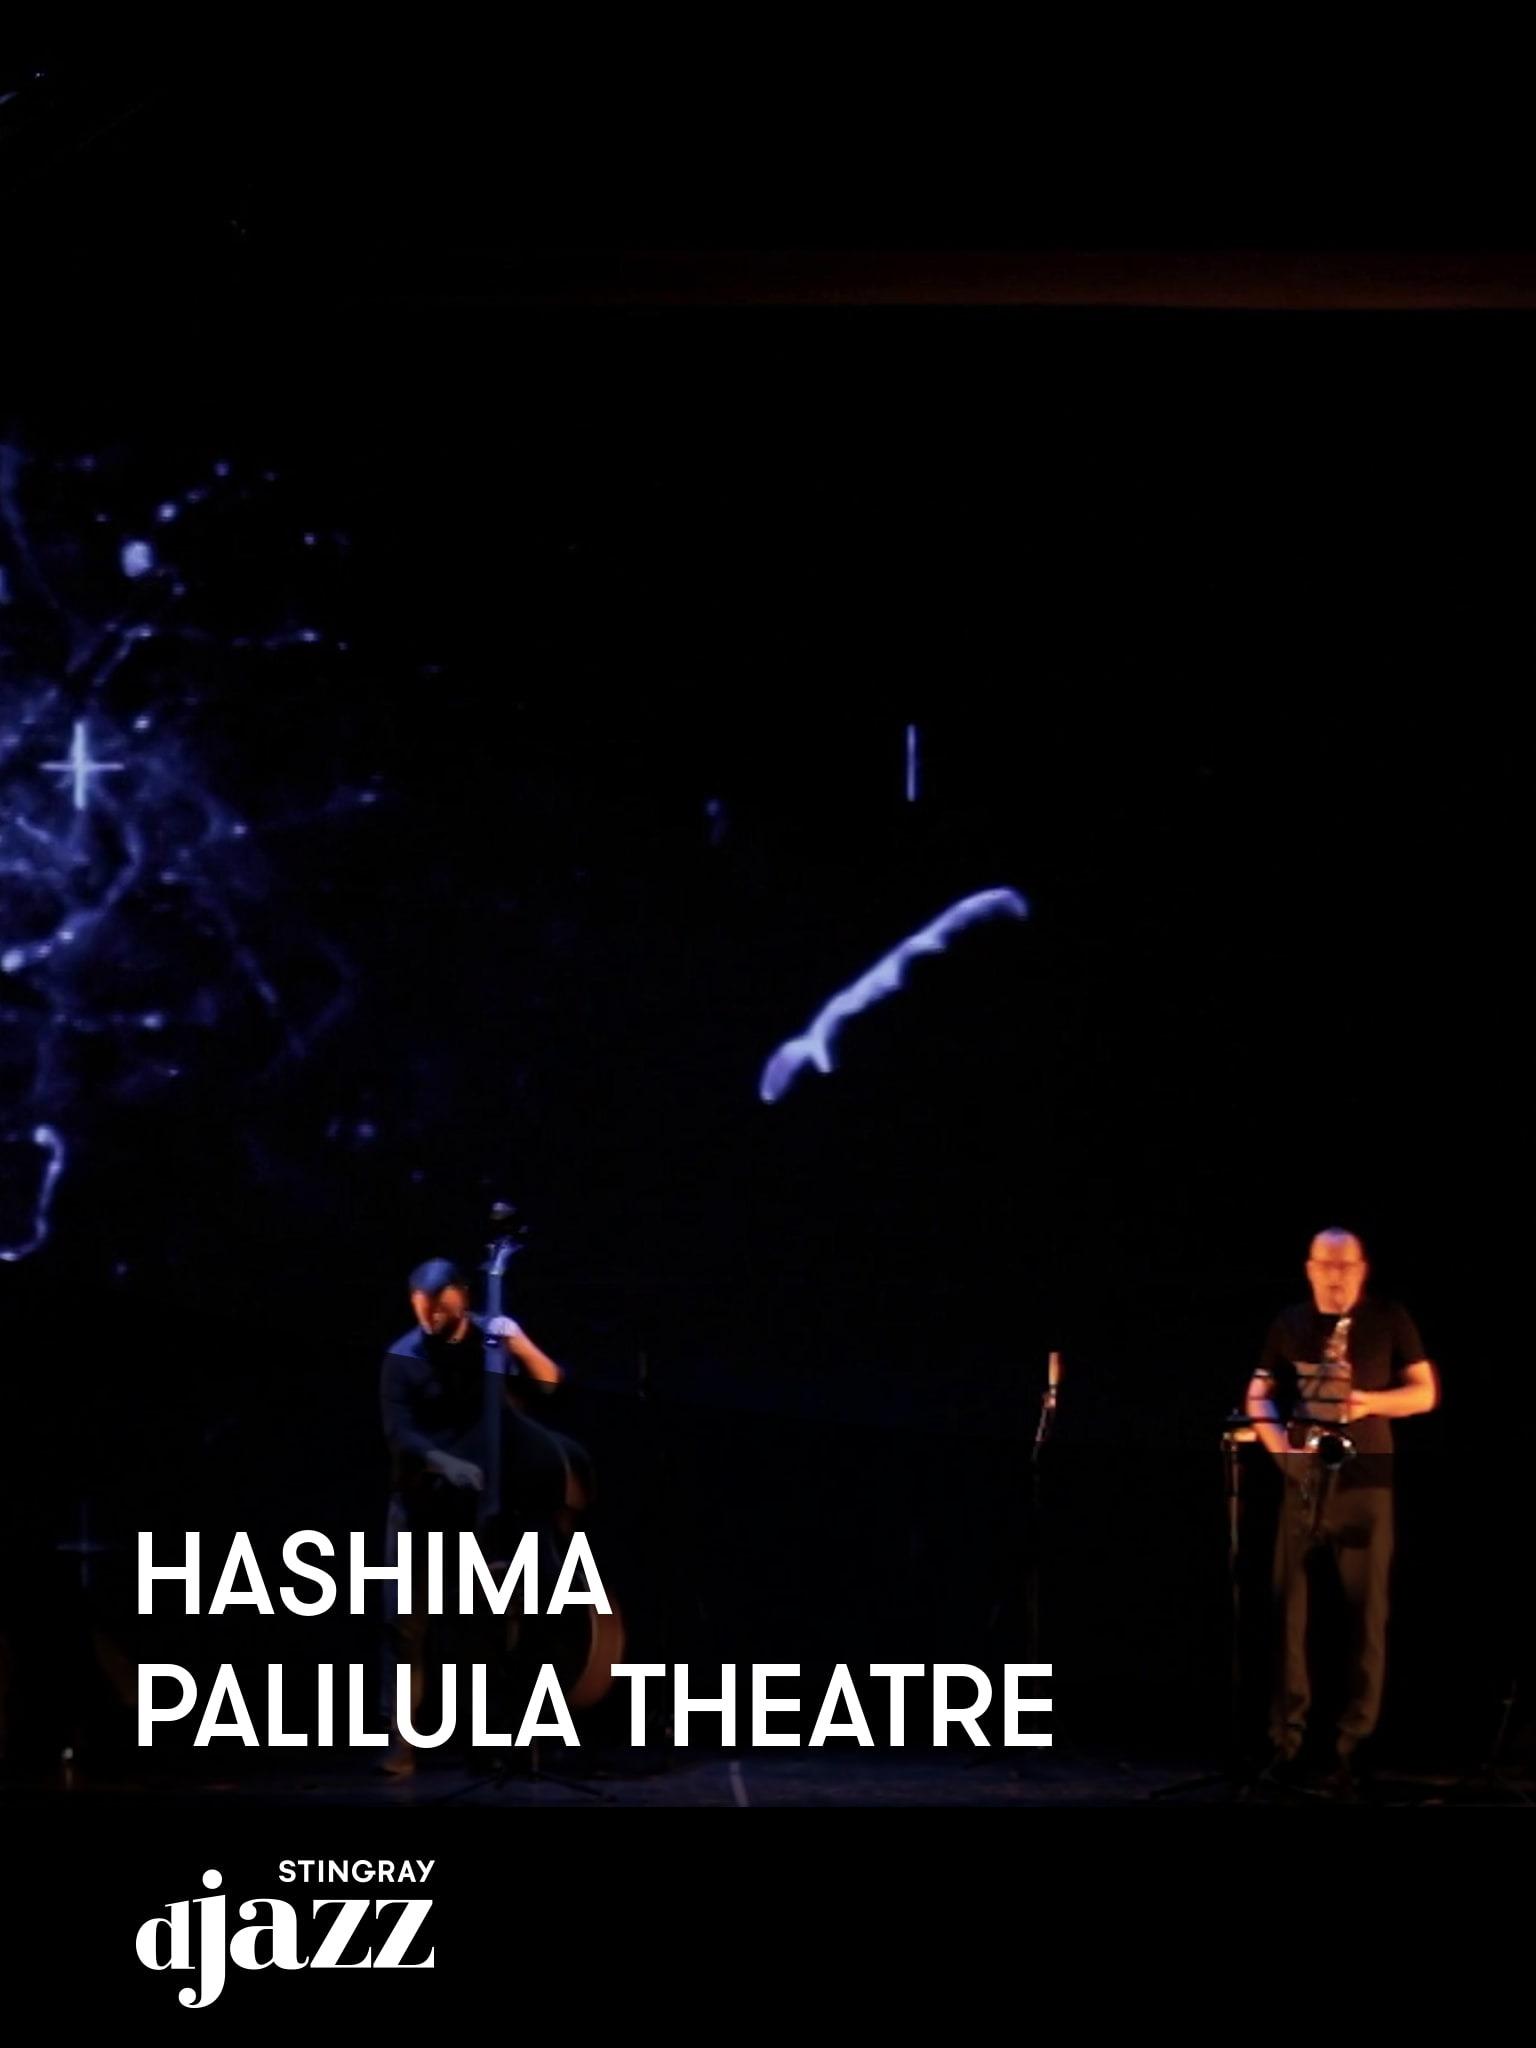 Hashima - Palilula Theatre